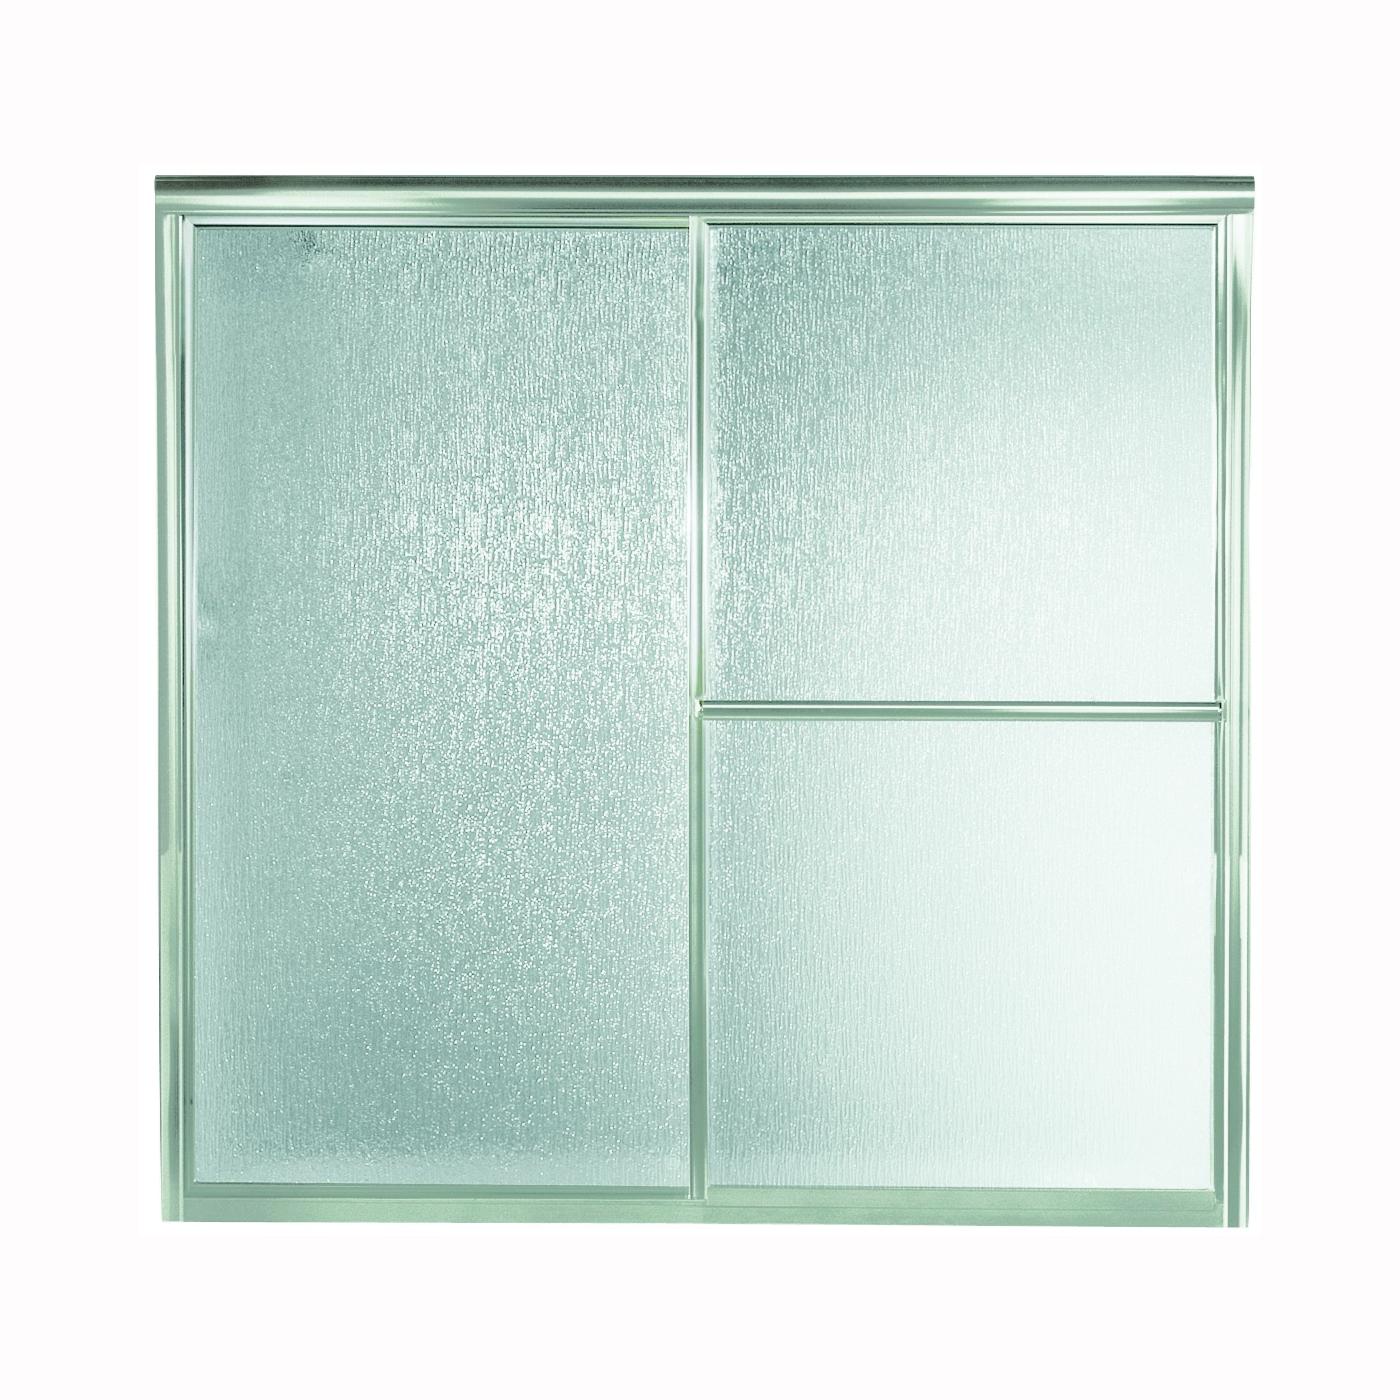 Picture of Sterling 5900 Series 5906-59S Bath Door, Deluxe Frame, Aluminum Frame, Rain Glass, Tempered Glass, Sliding Door